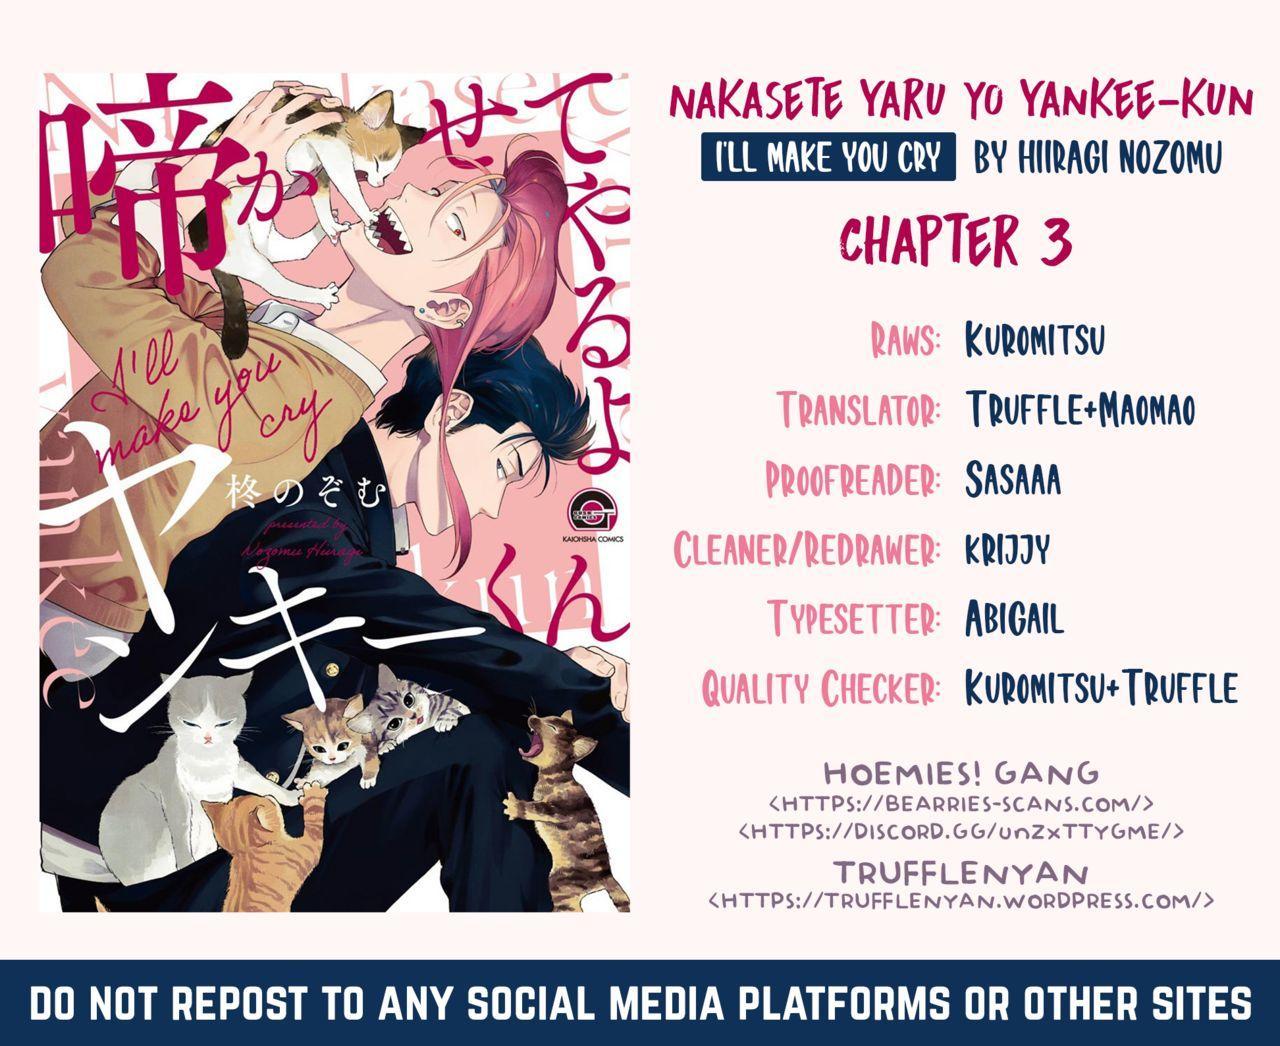 [Hiiragi Nozomu] Nakasete Yaru yo Yankee-kun   I'll Make You Cry Ch. 1-5 + Extras [English] [Digital] 84